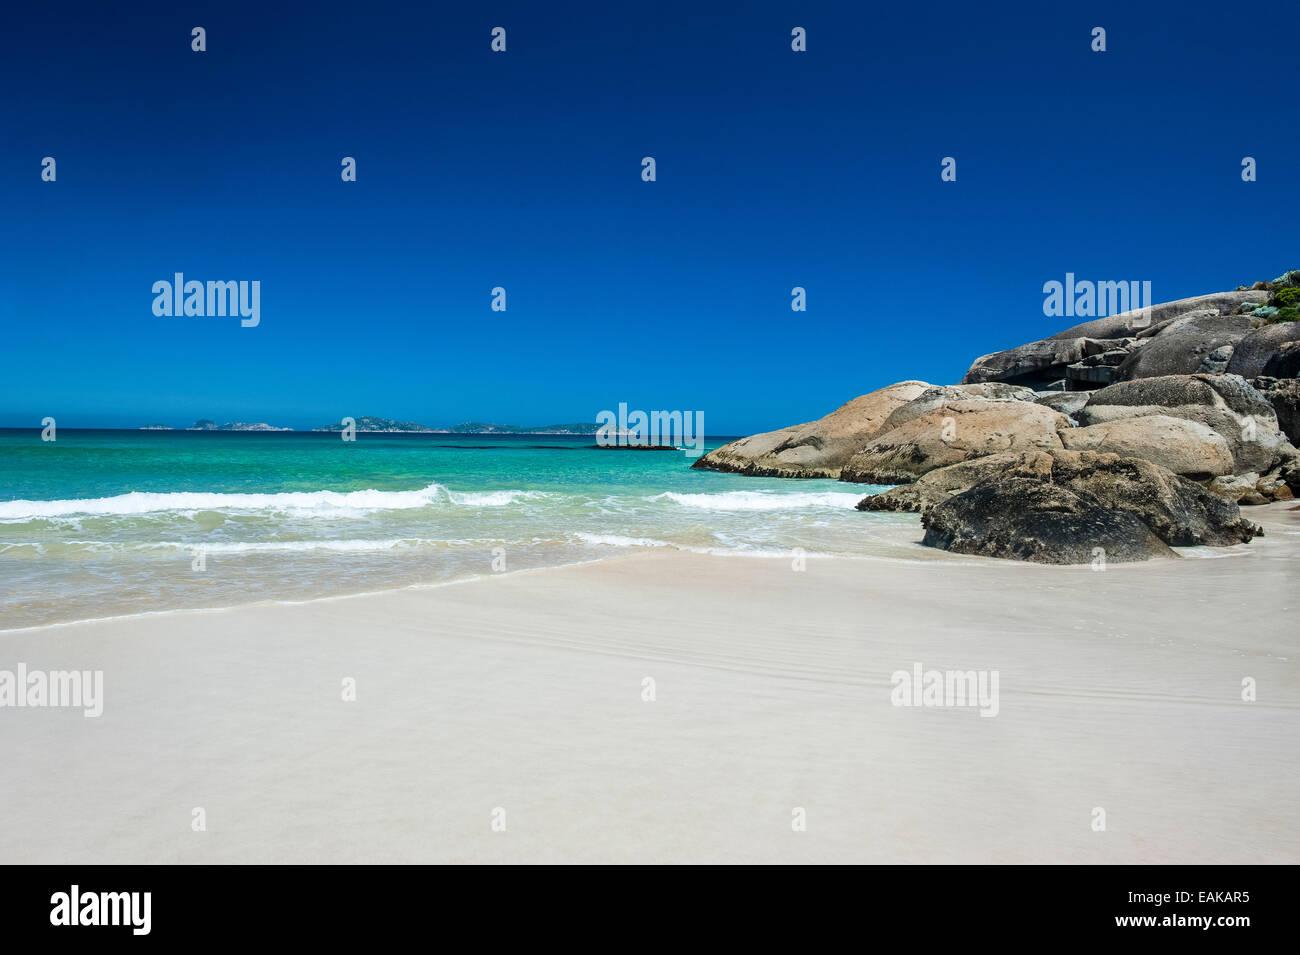 Norman Beach, Wilsons Promontory National Park, Victoria, Australia Immagini Stock